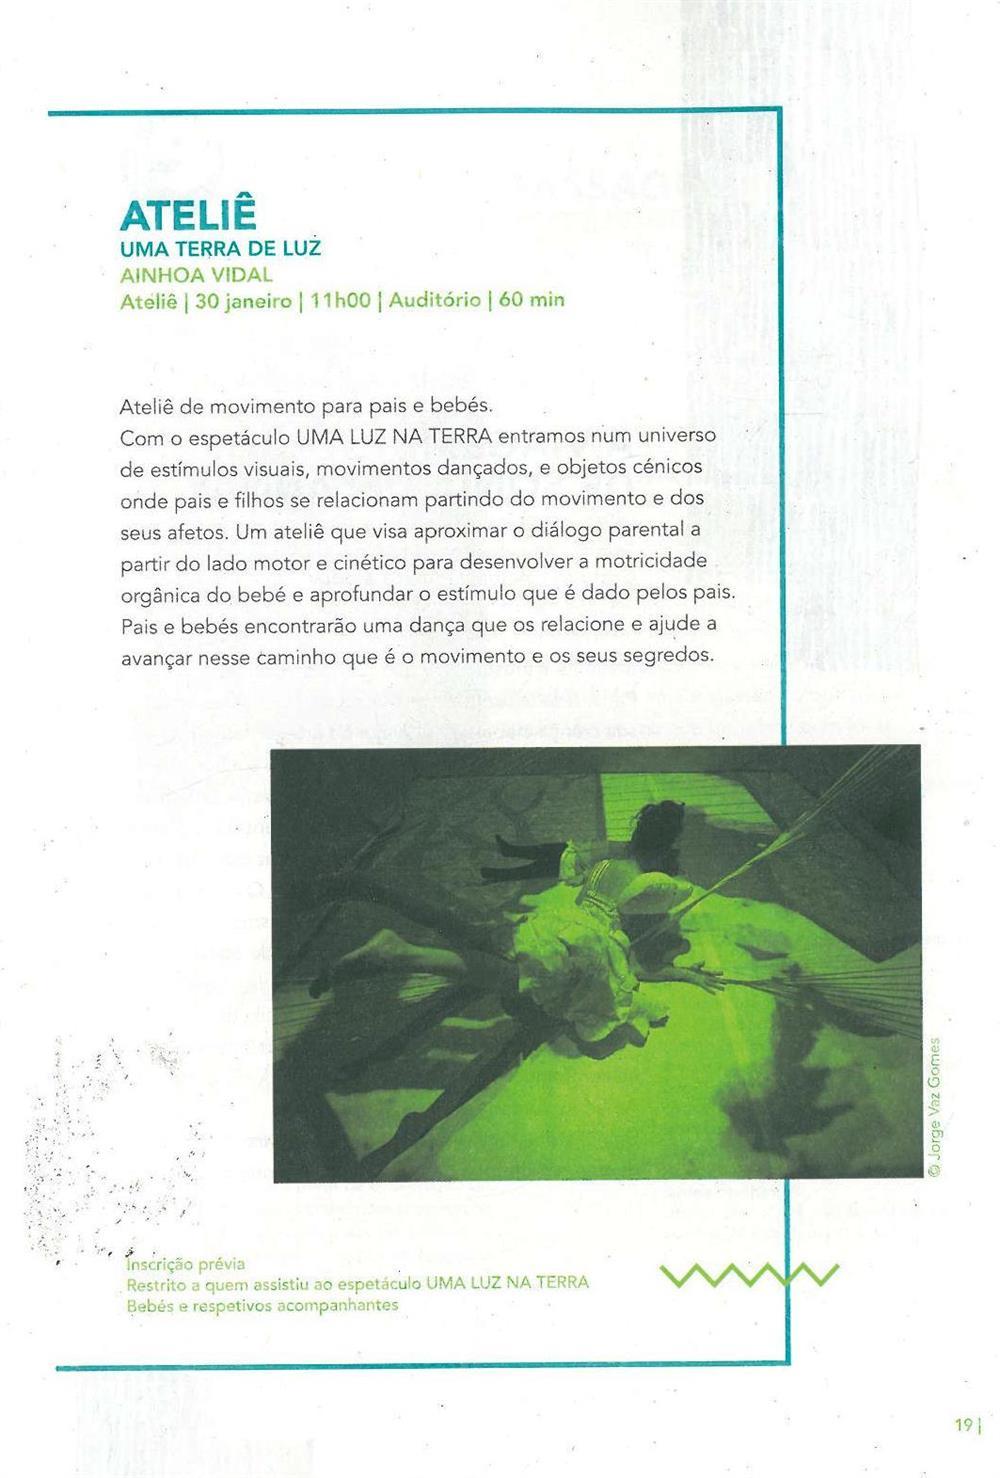 ACMSV-jan.,fev.,mar.'16-p.19-Uma Terra de luz : Ainhoa Vidal : ateliê.jpg